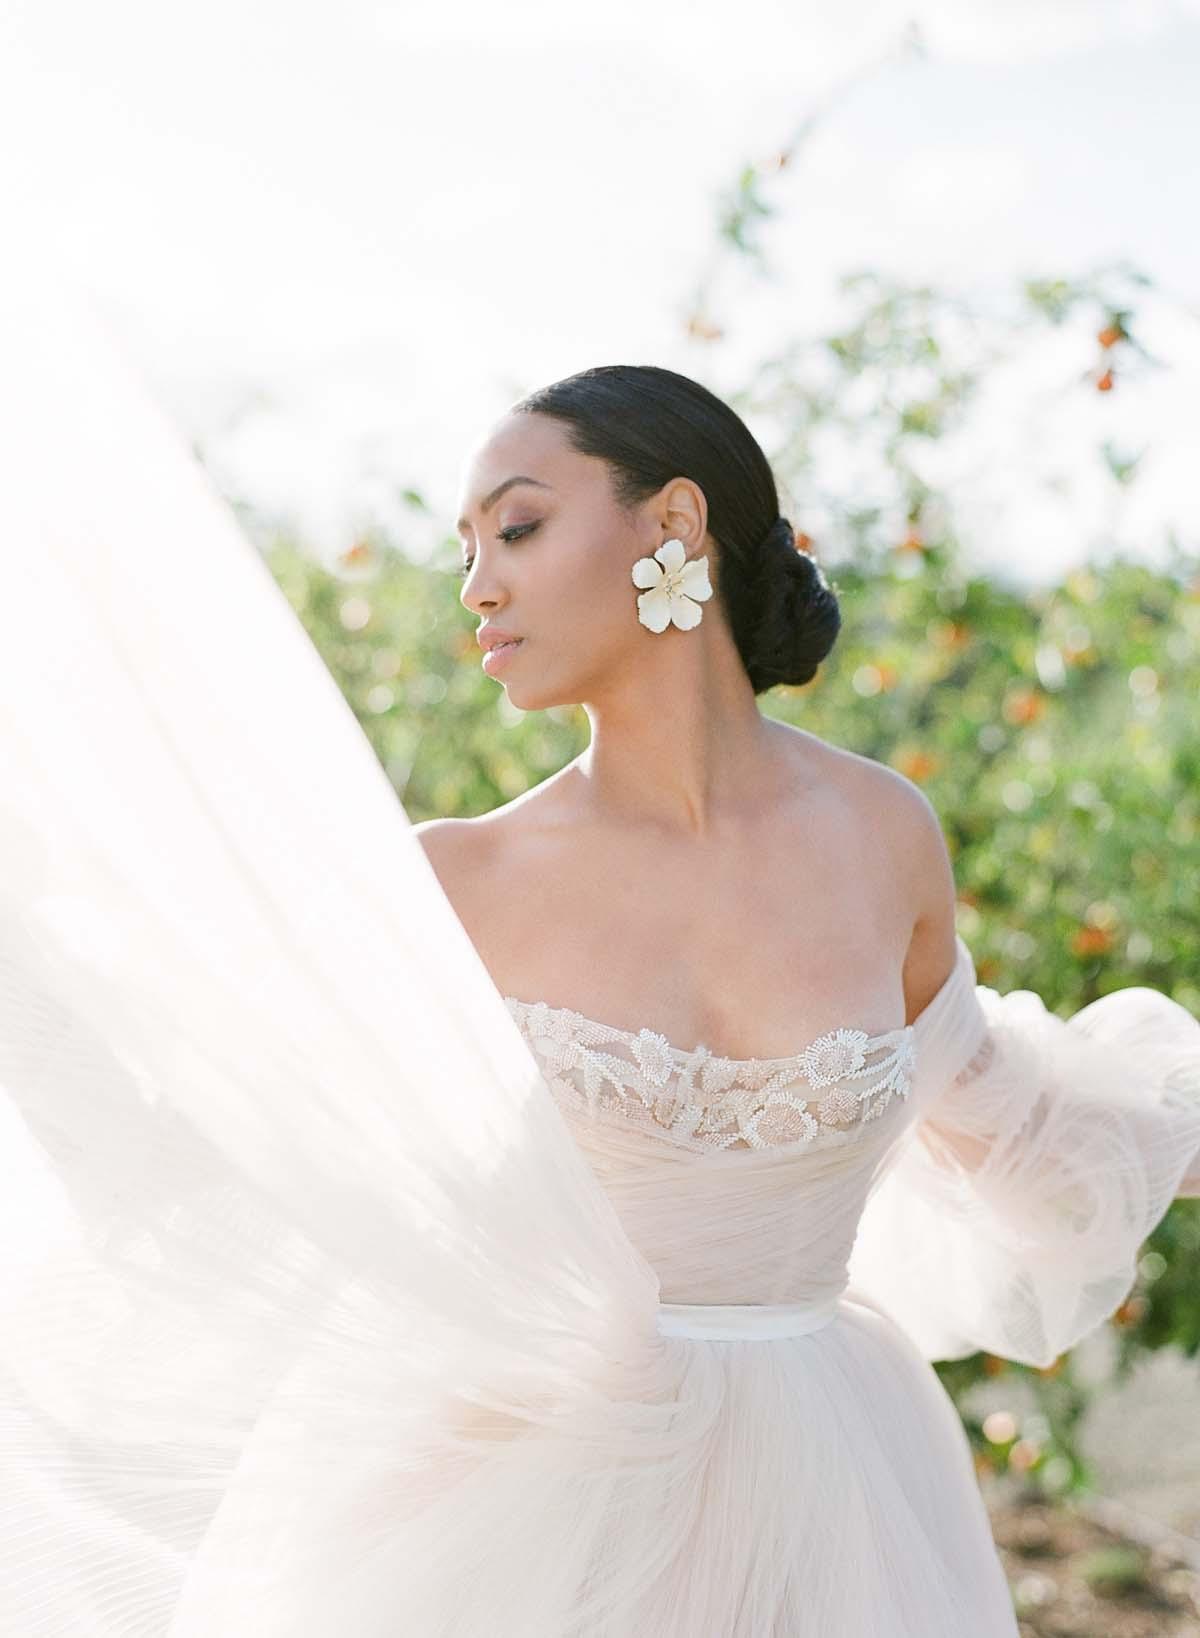 XOXO_BRIDE_Events-Michelle-Beller_Photography_0138